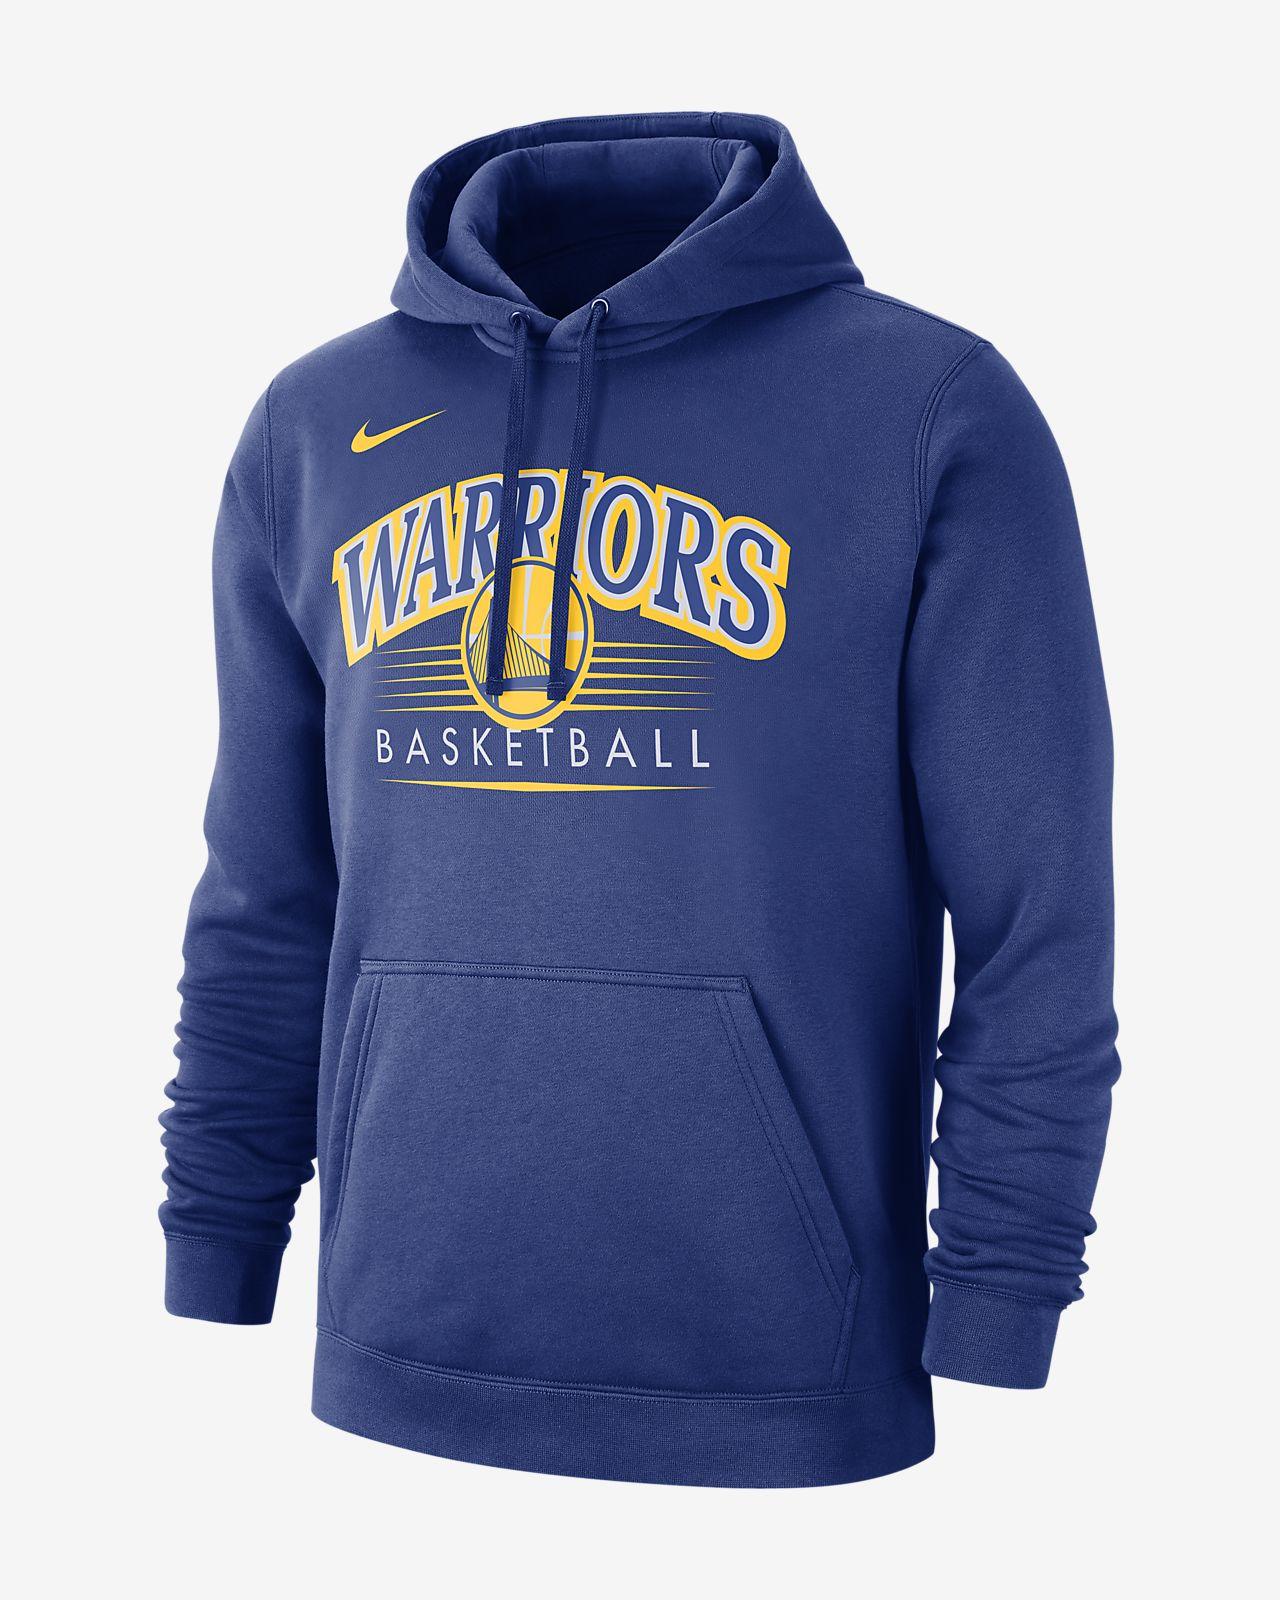 Golden State Warriors Nike Sudadera con capucha de la NBA - Hombre